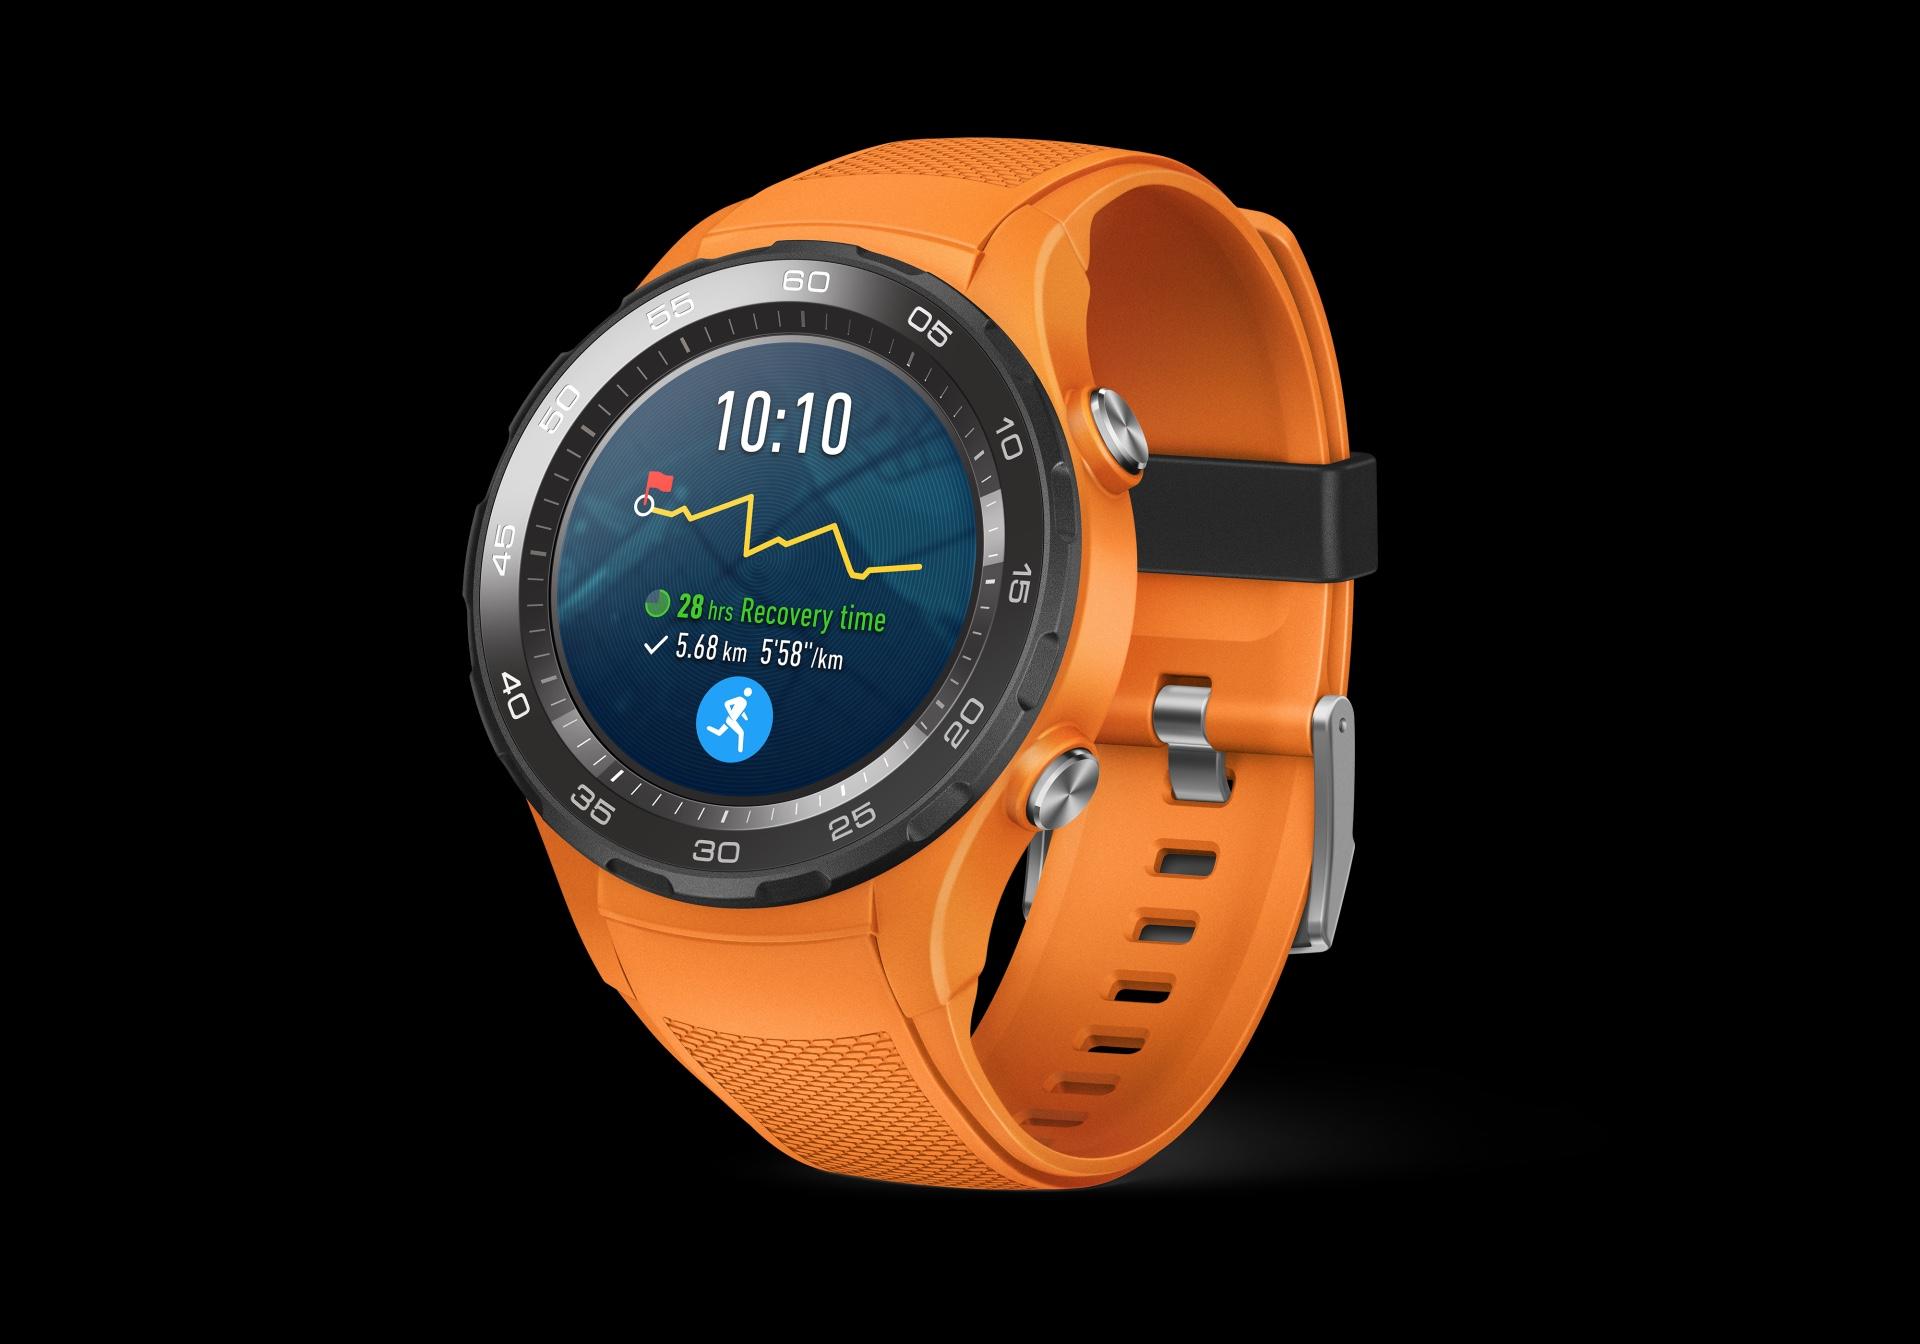 Huawei z nowym zegarkiem. Pobije Apple? Huawei mediarun watch huawei